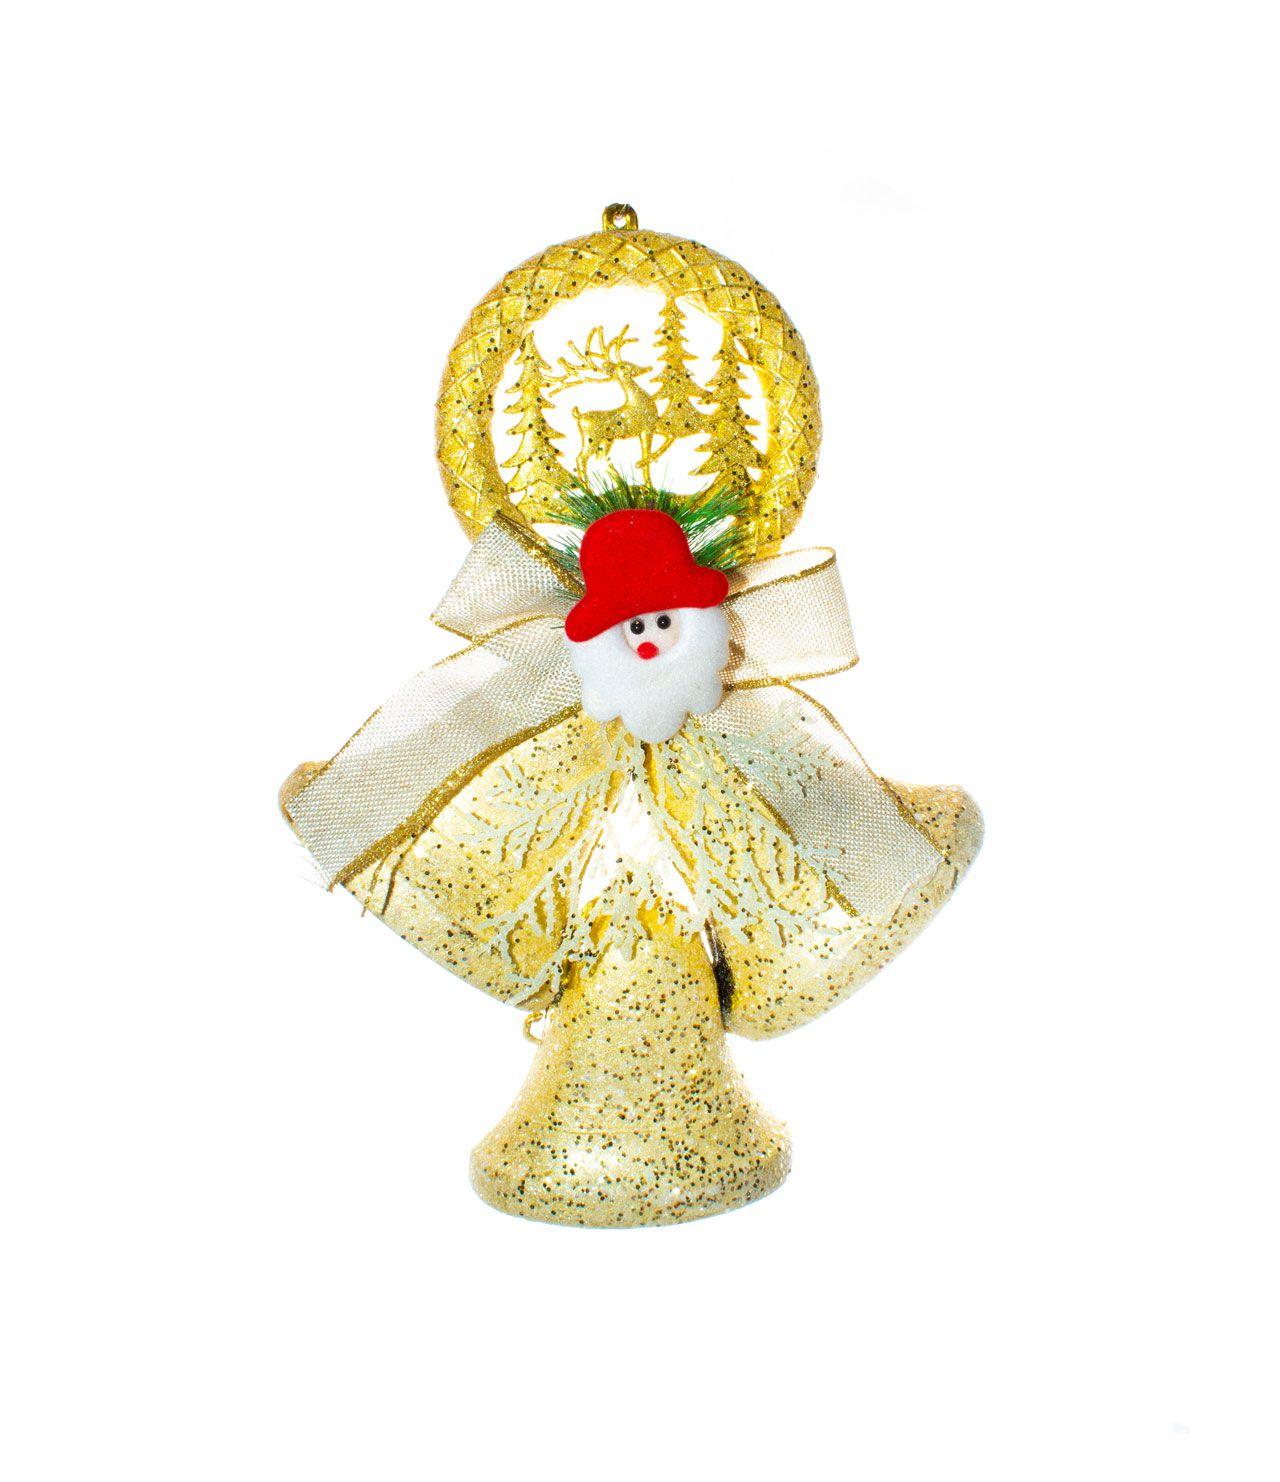 Sino Dourado Com Rosto Papai Noel  -  1 Un